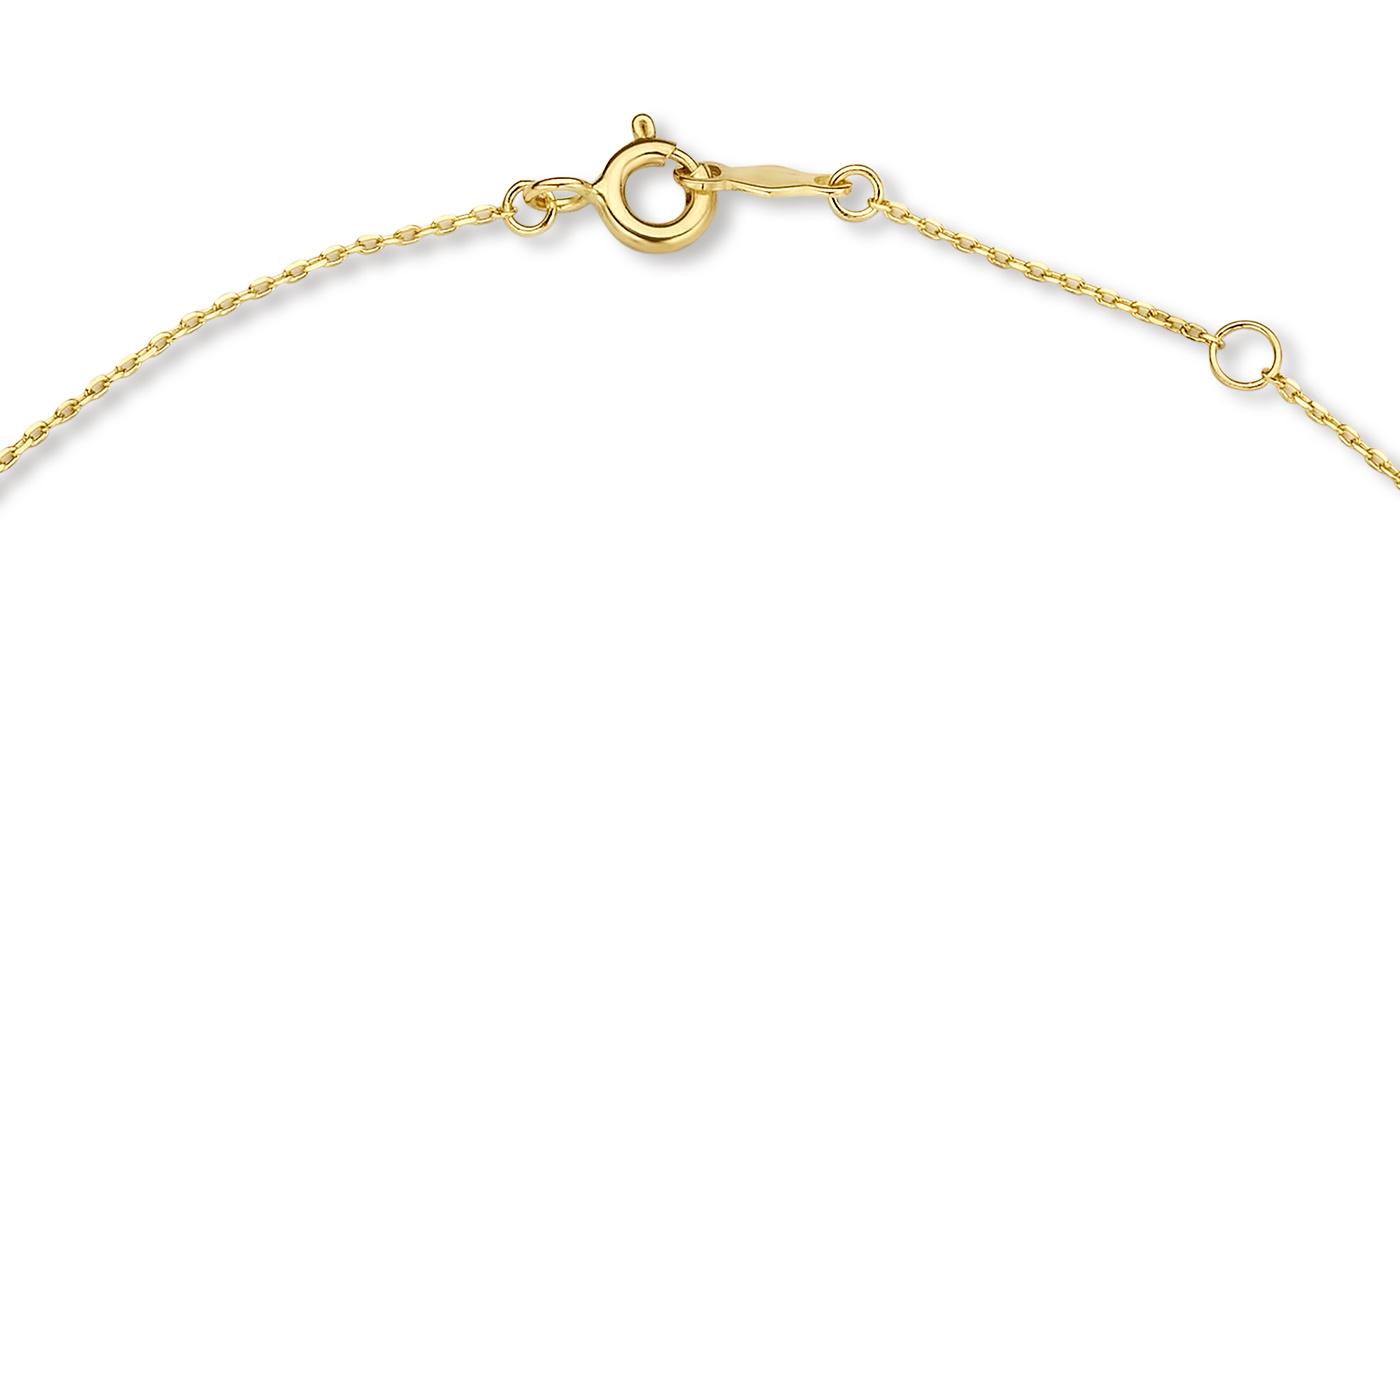 Isabel Bernard Le Marais Dauphine 585er Goldkette mit Stangen